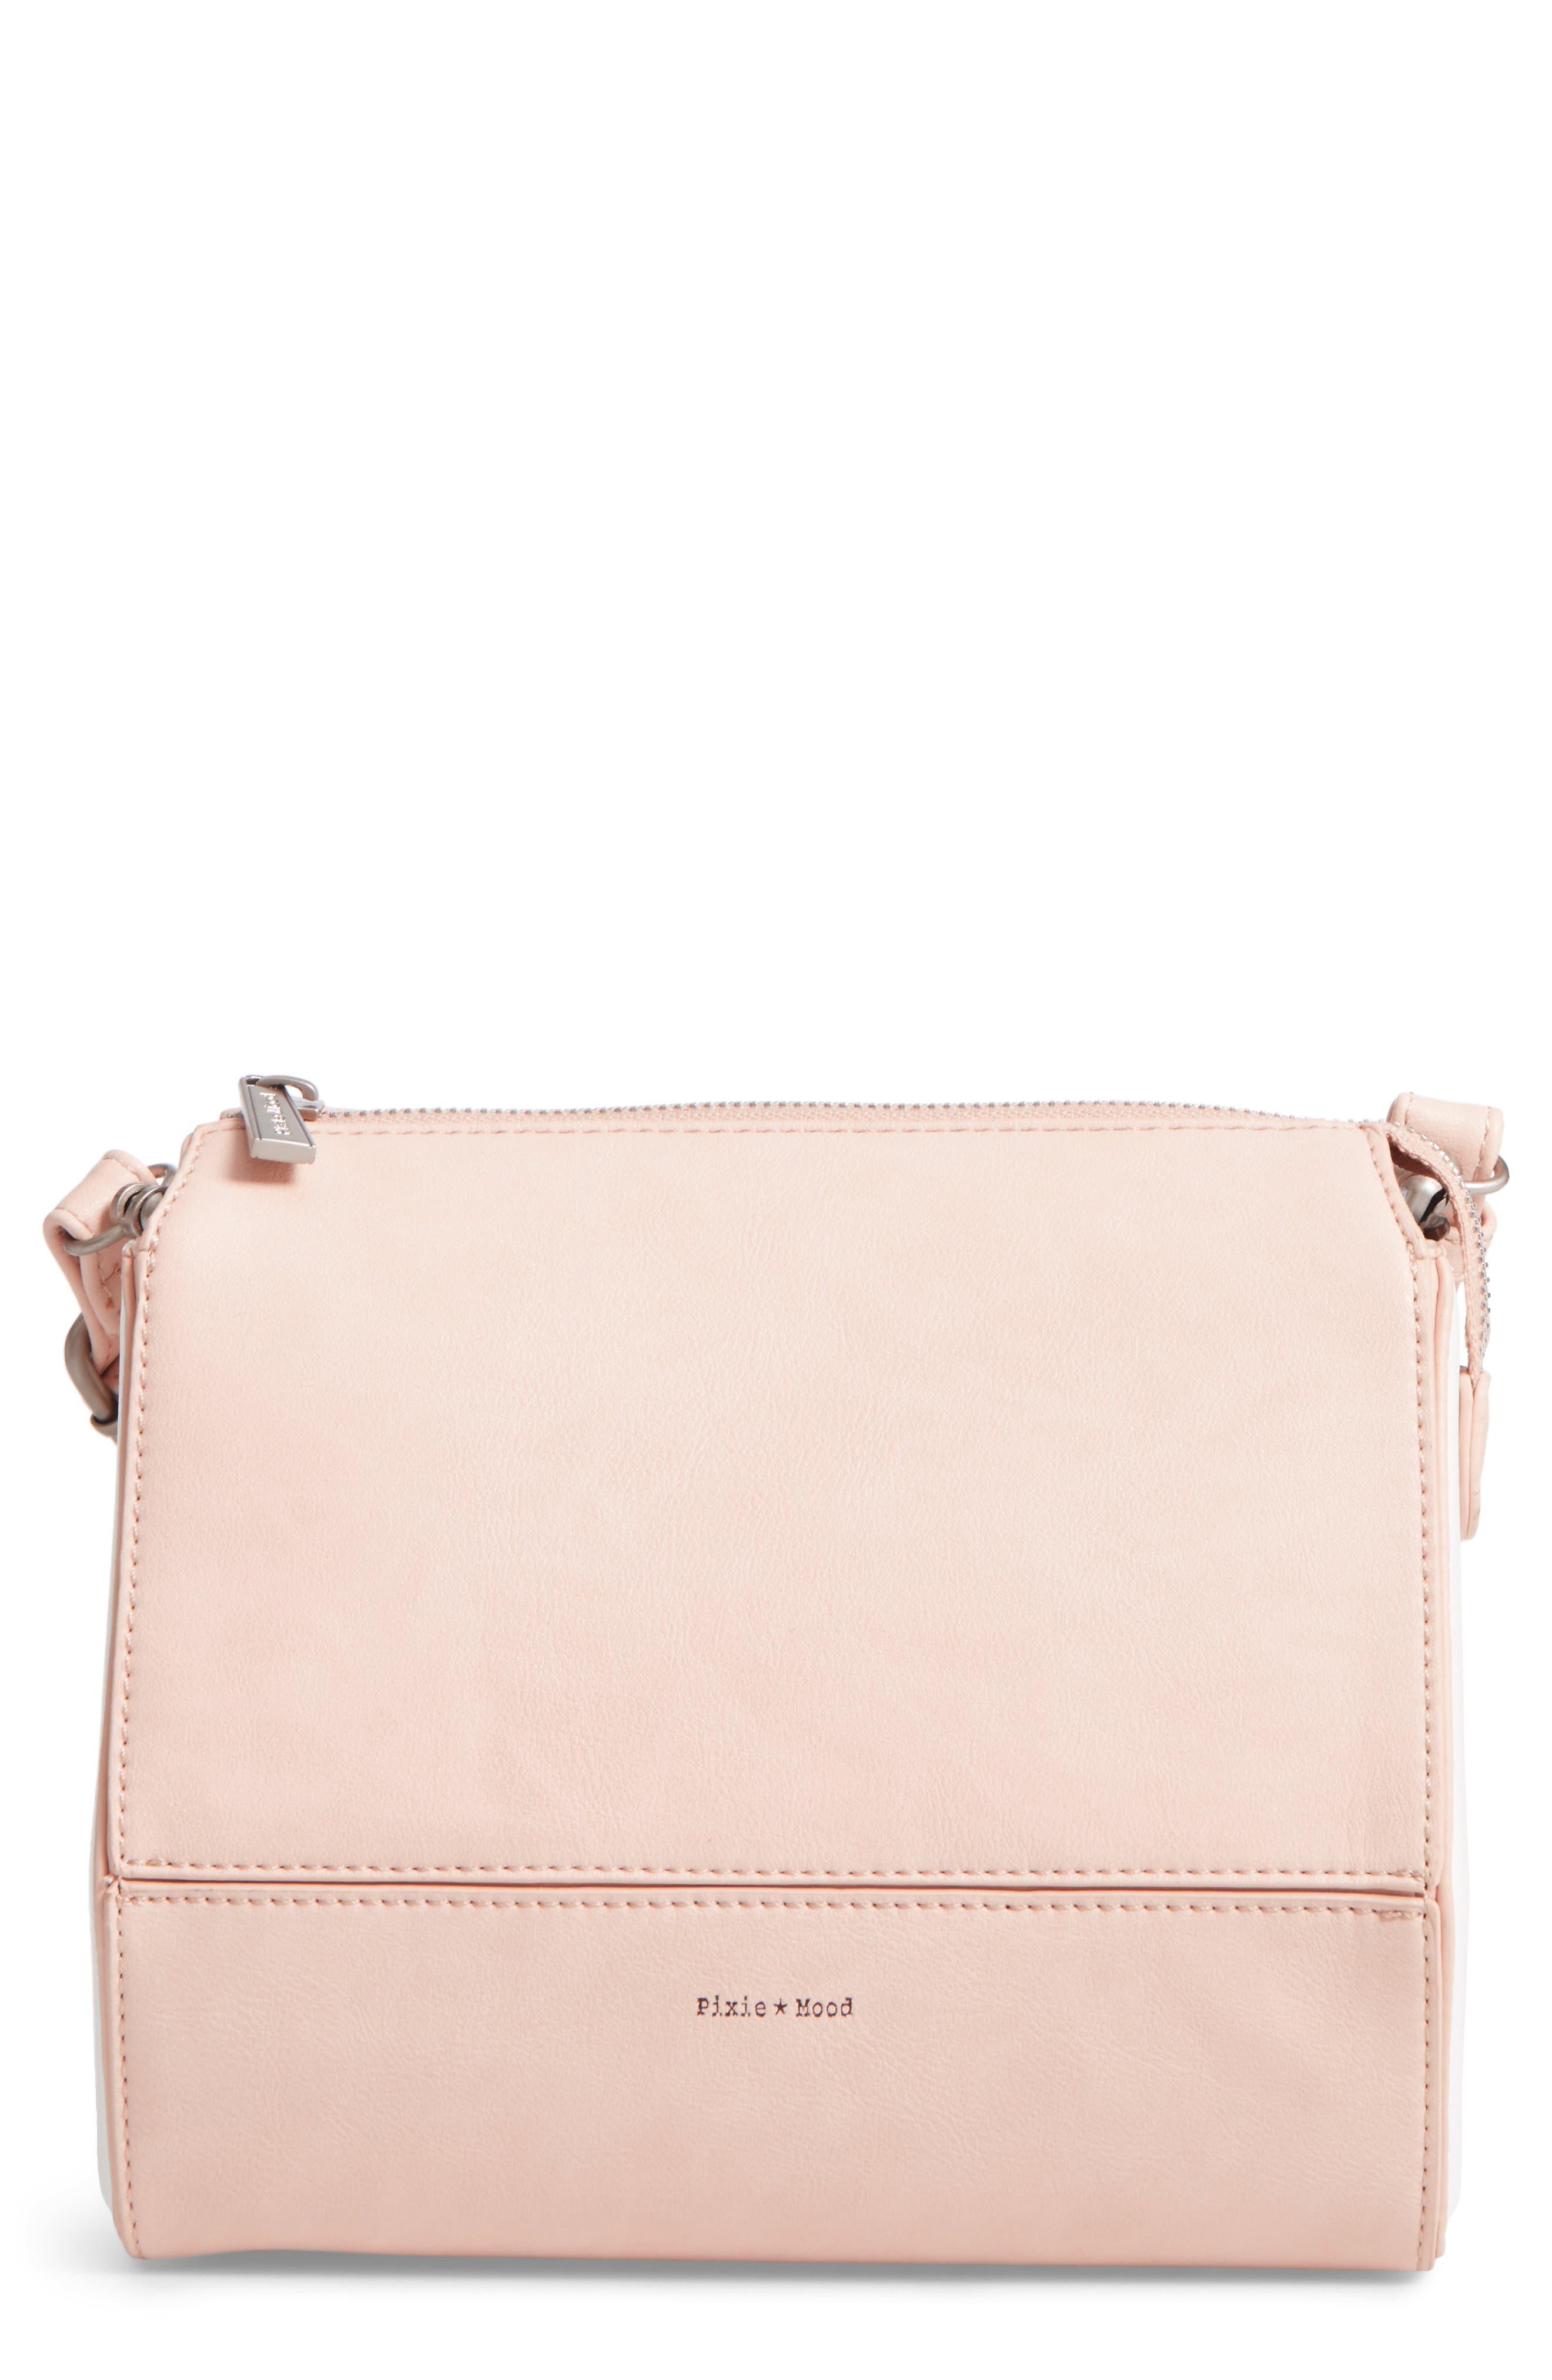 Pixie Mood Faux Leather Crossbody Bag